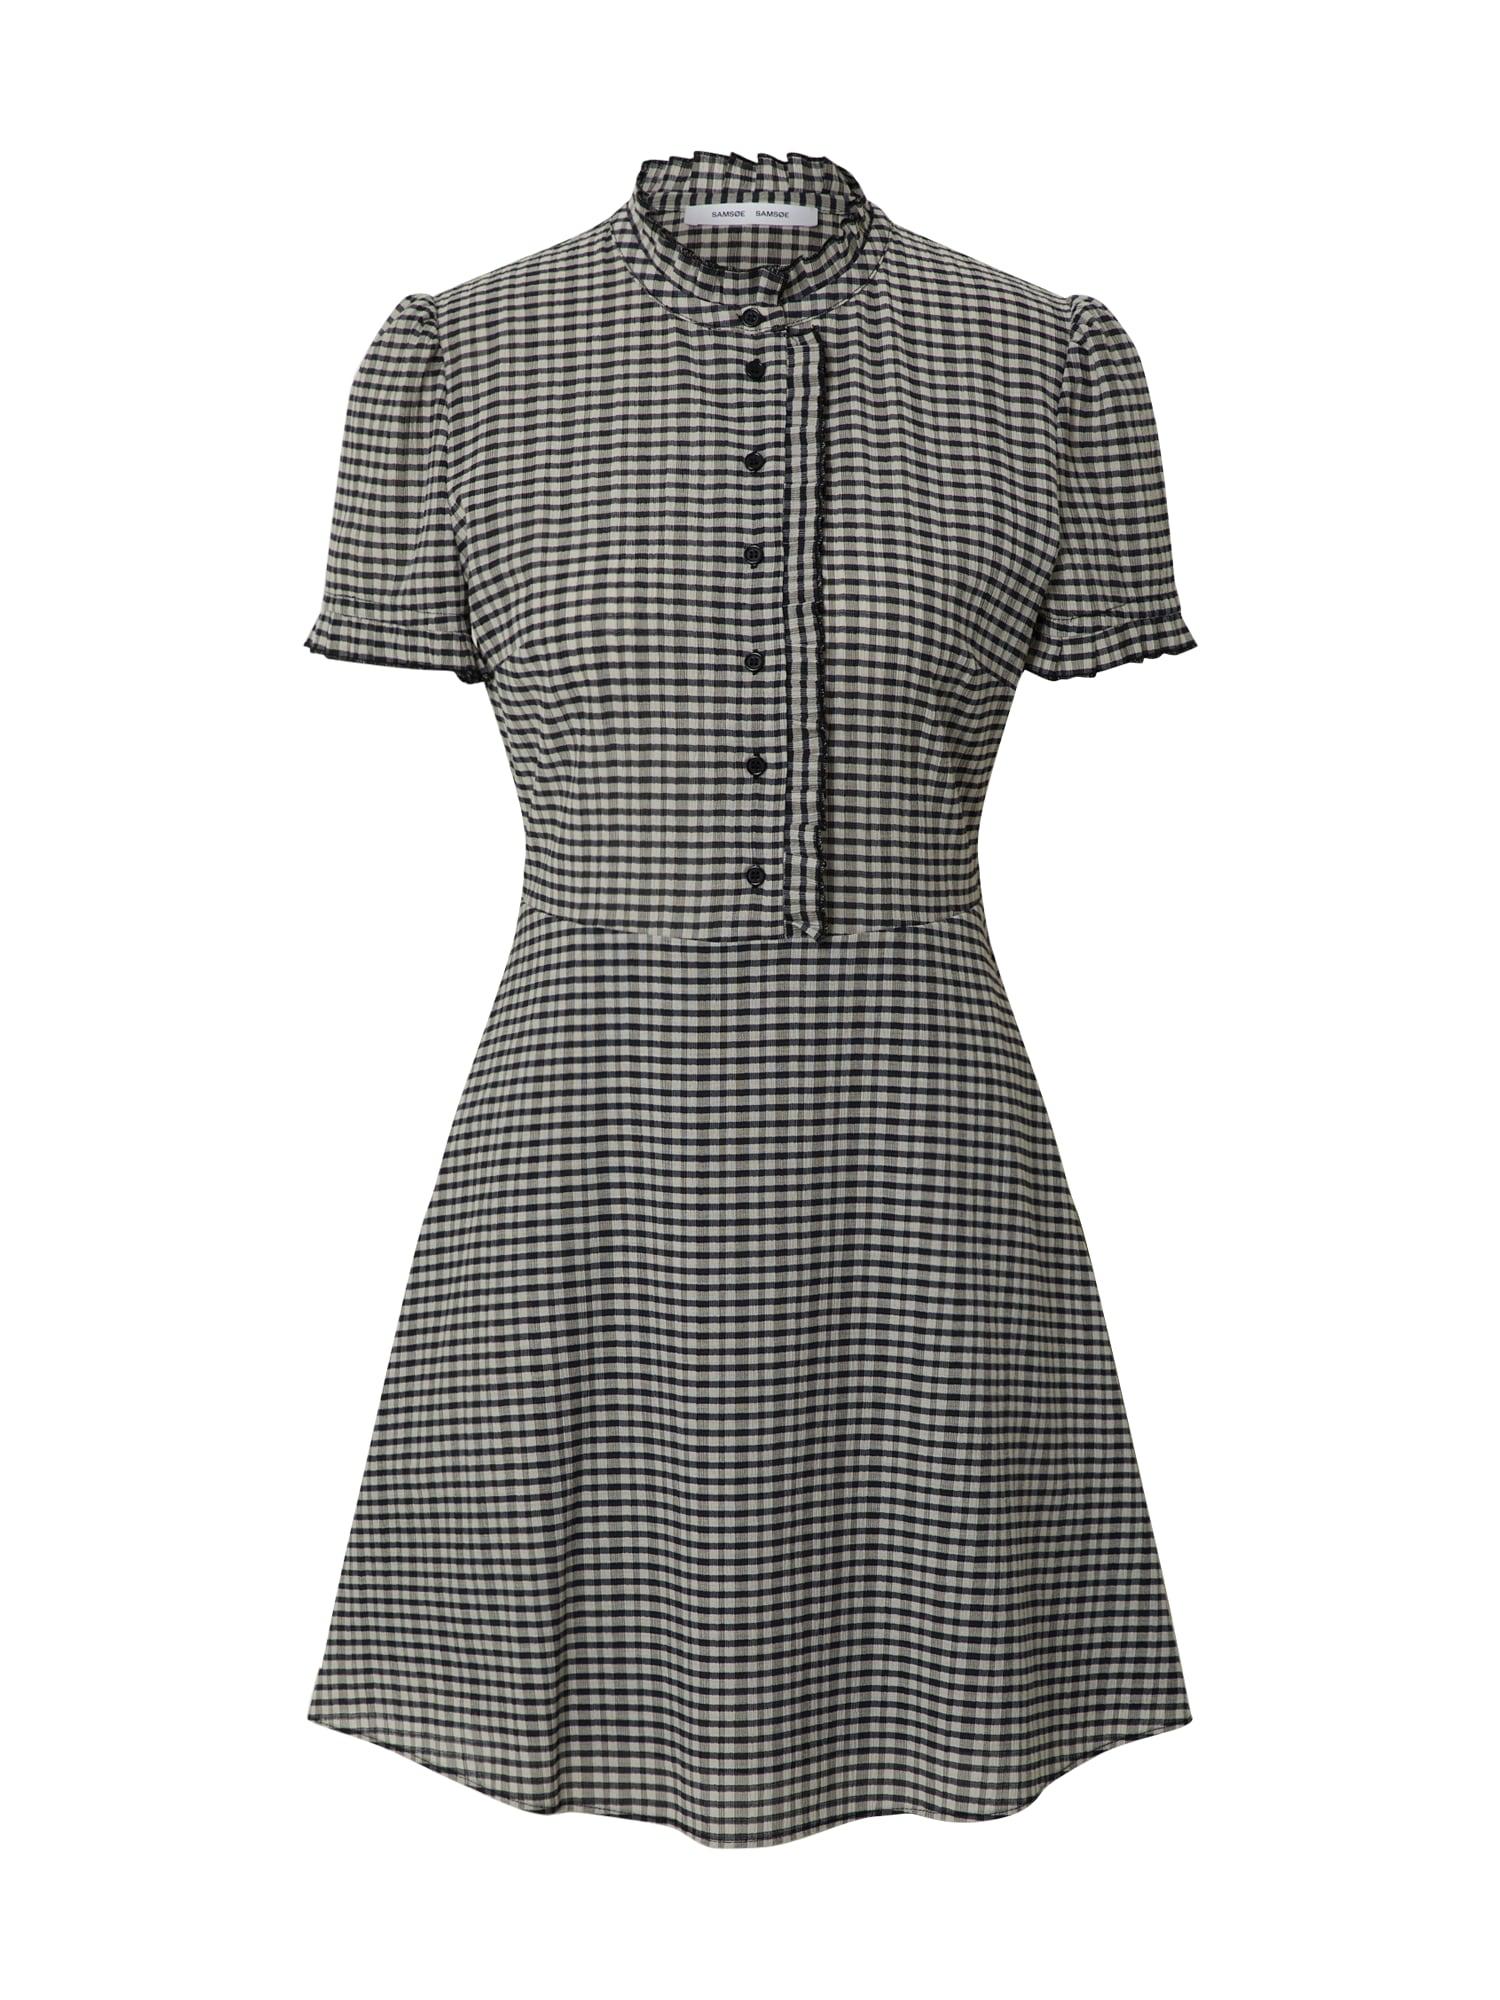 Samsoe Samsoe Košeľové šaty 'Zarani'  biela / čierna